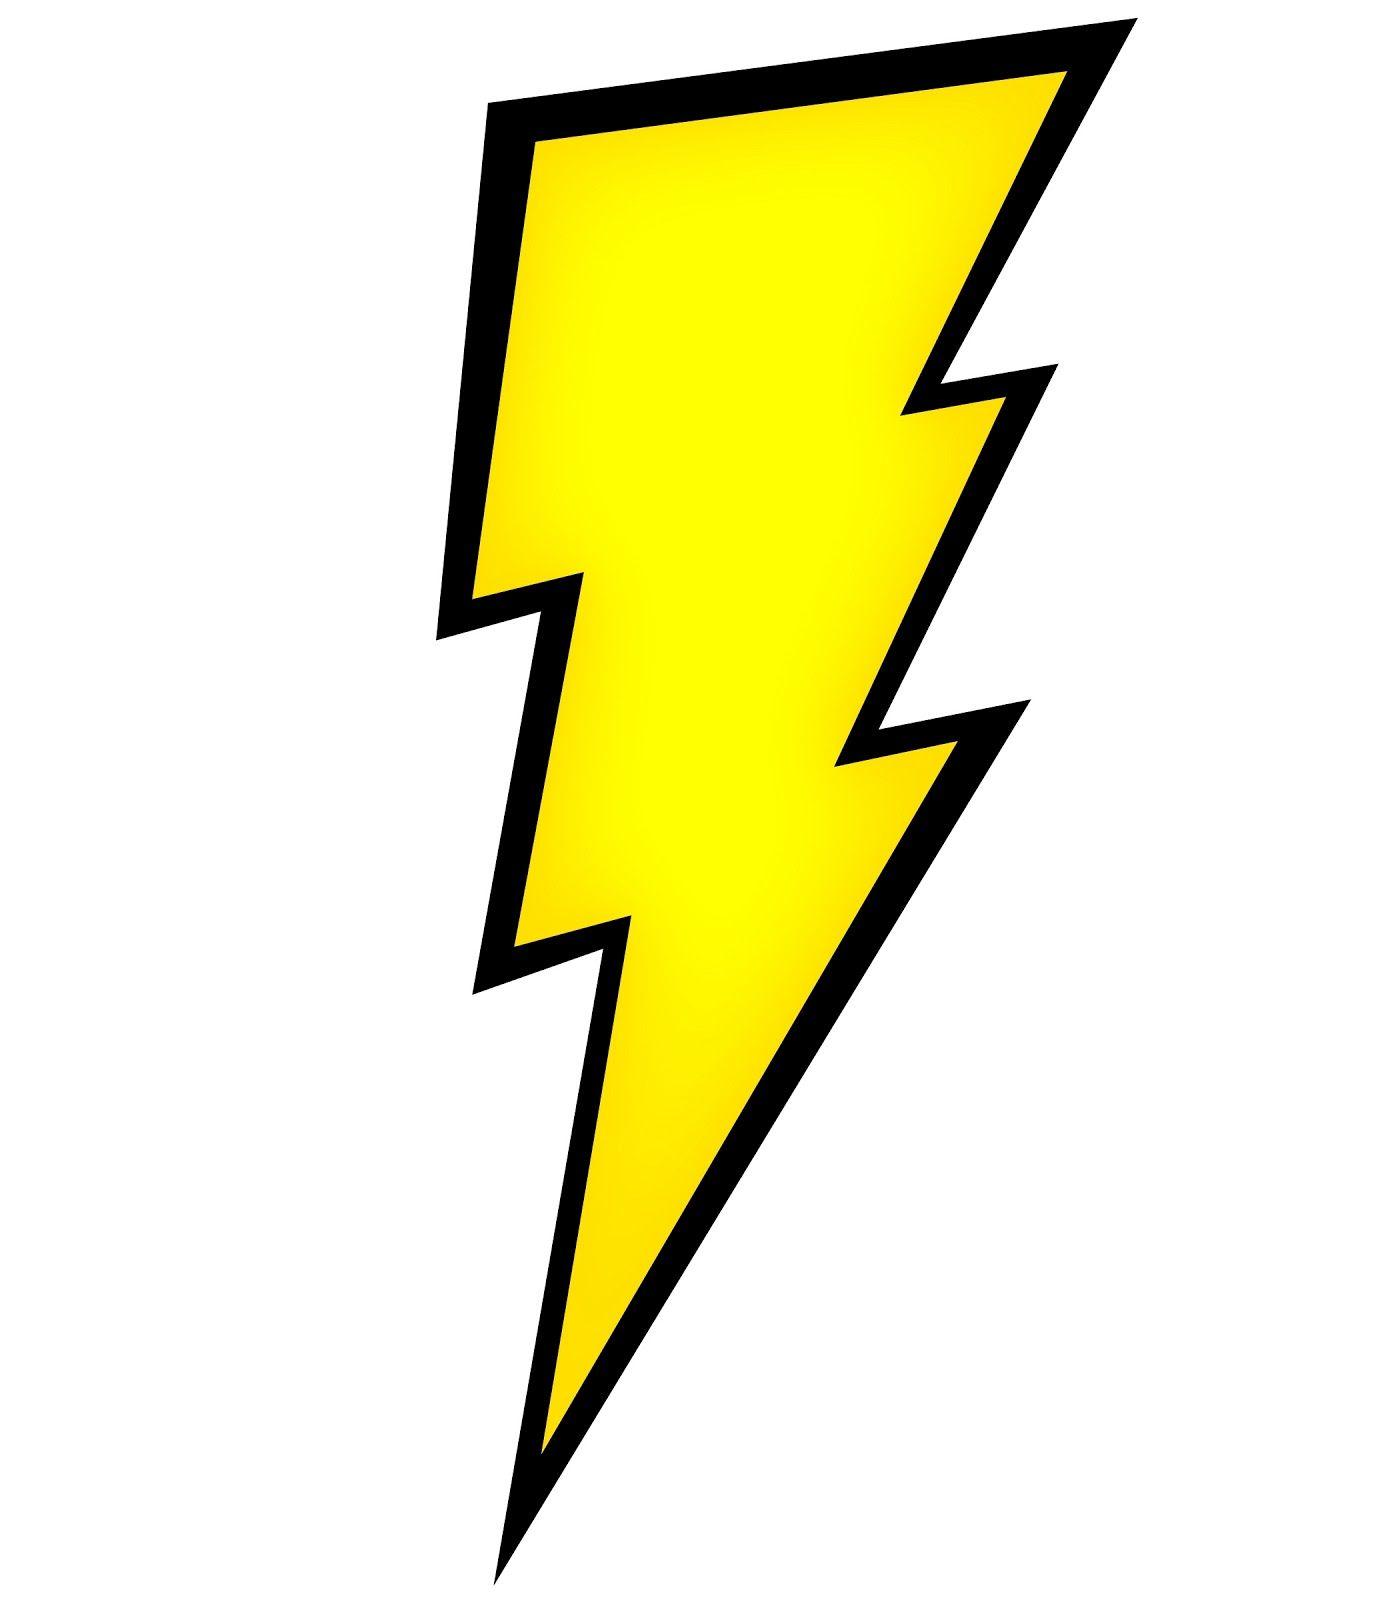 free lightning bolt clipart images.